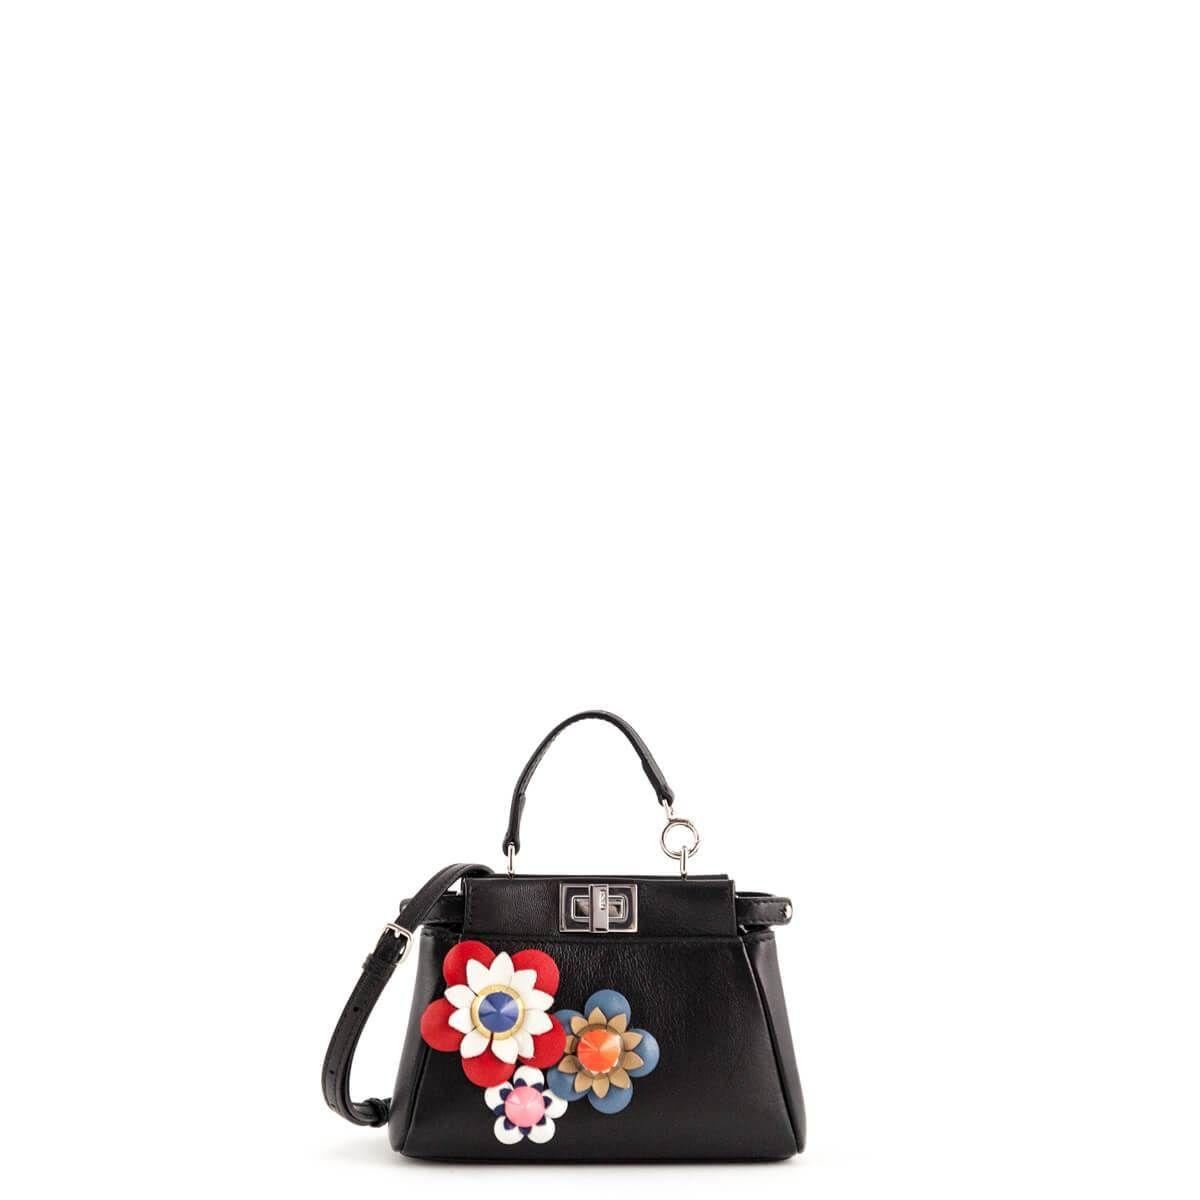 59f6d709fbe5 Fendi Black Nappa Micro Peekaboo with Floral Applique - LOVEthatBAG - Preloved  Authentic Designer Handbags -